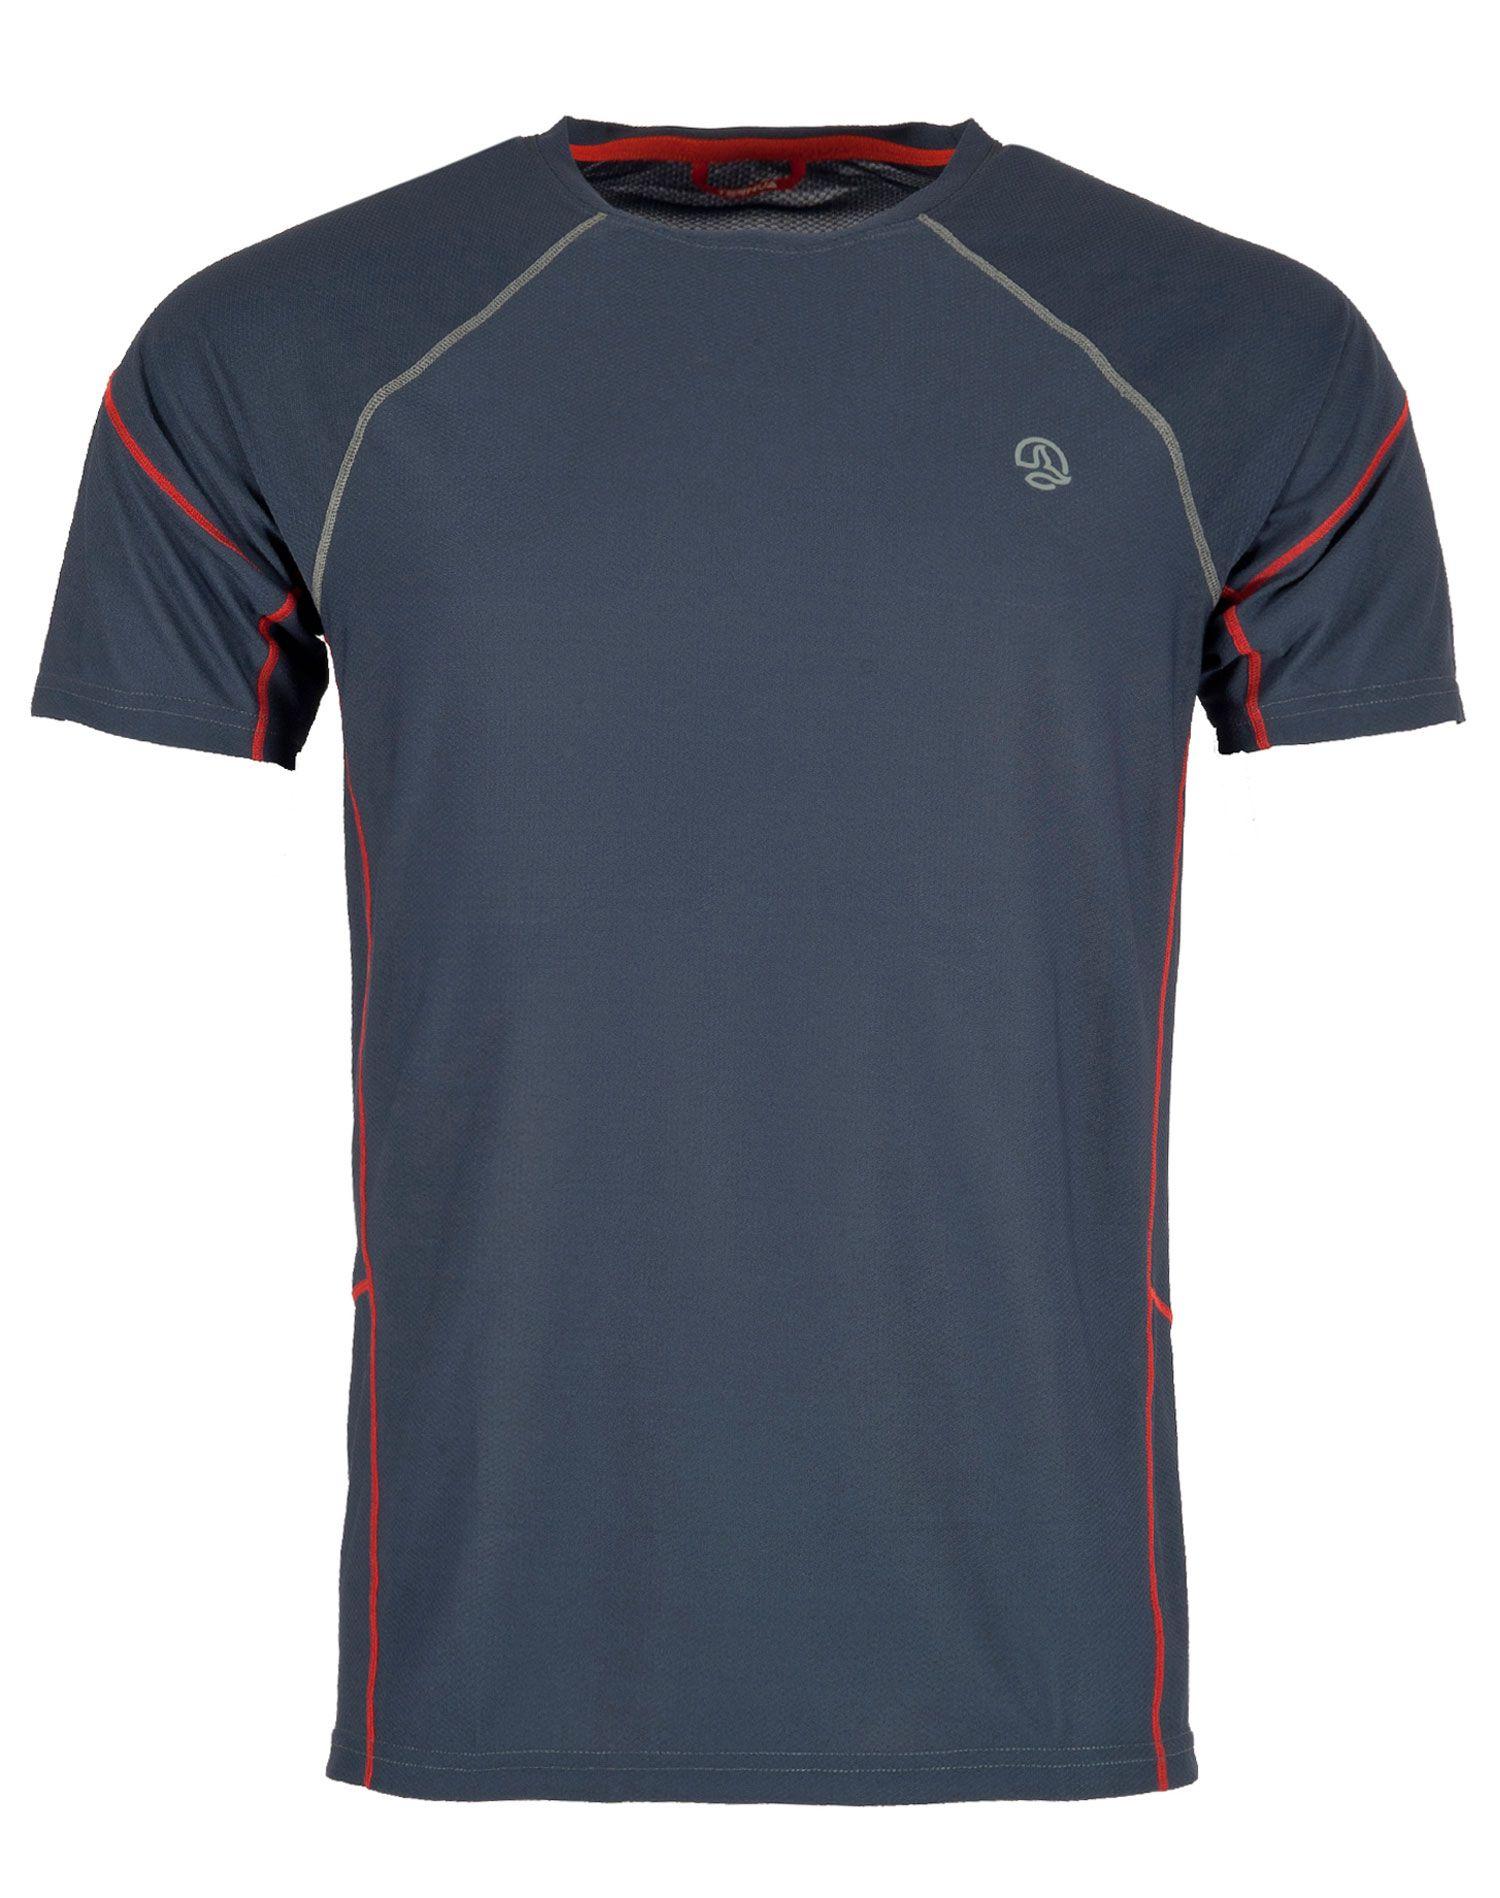 Ternua Tipas - T-shirt - Men's